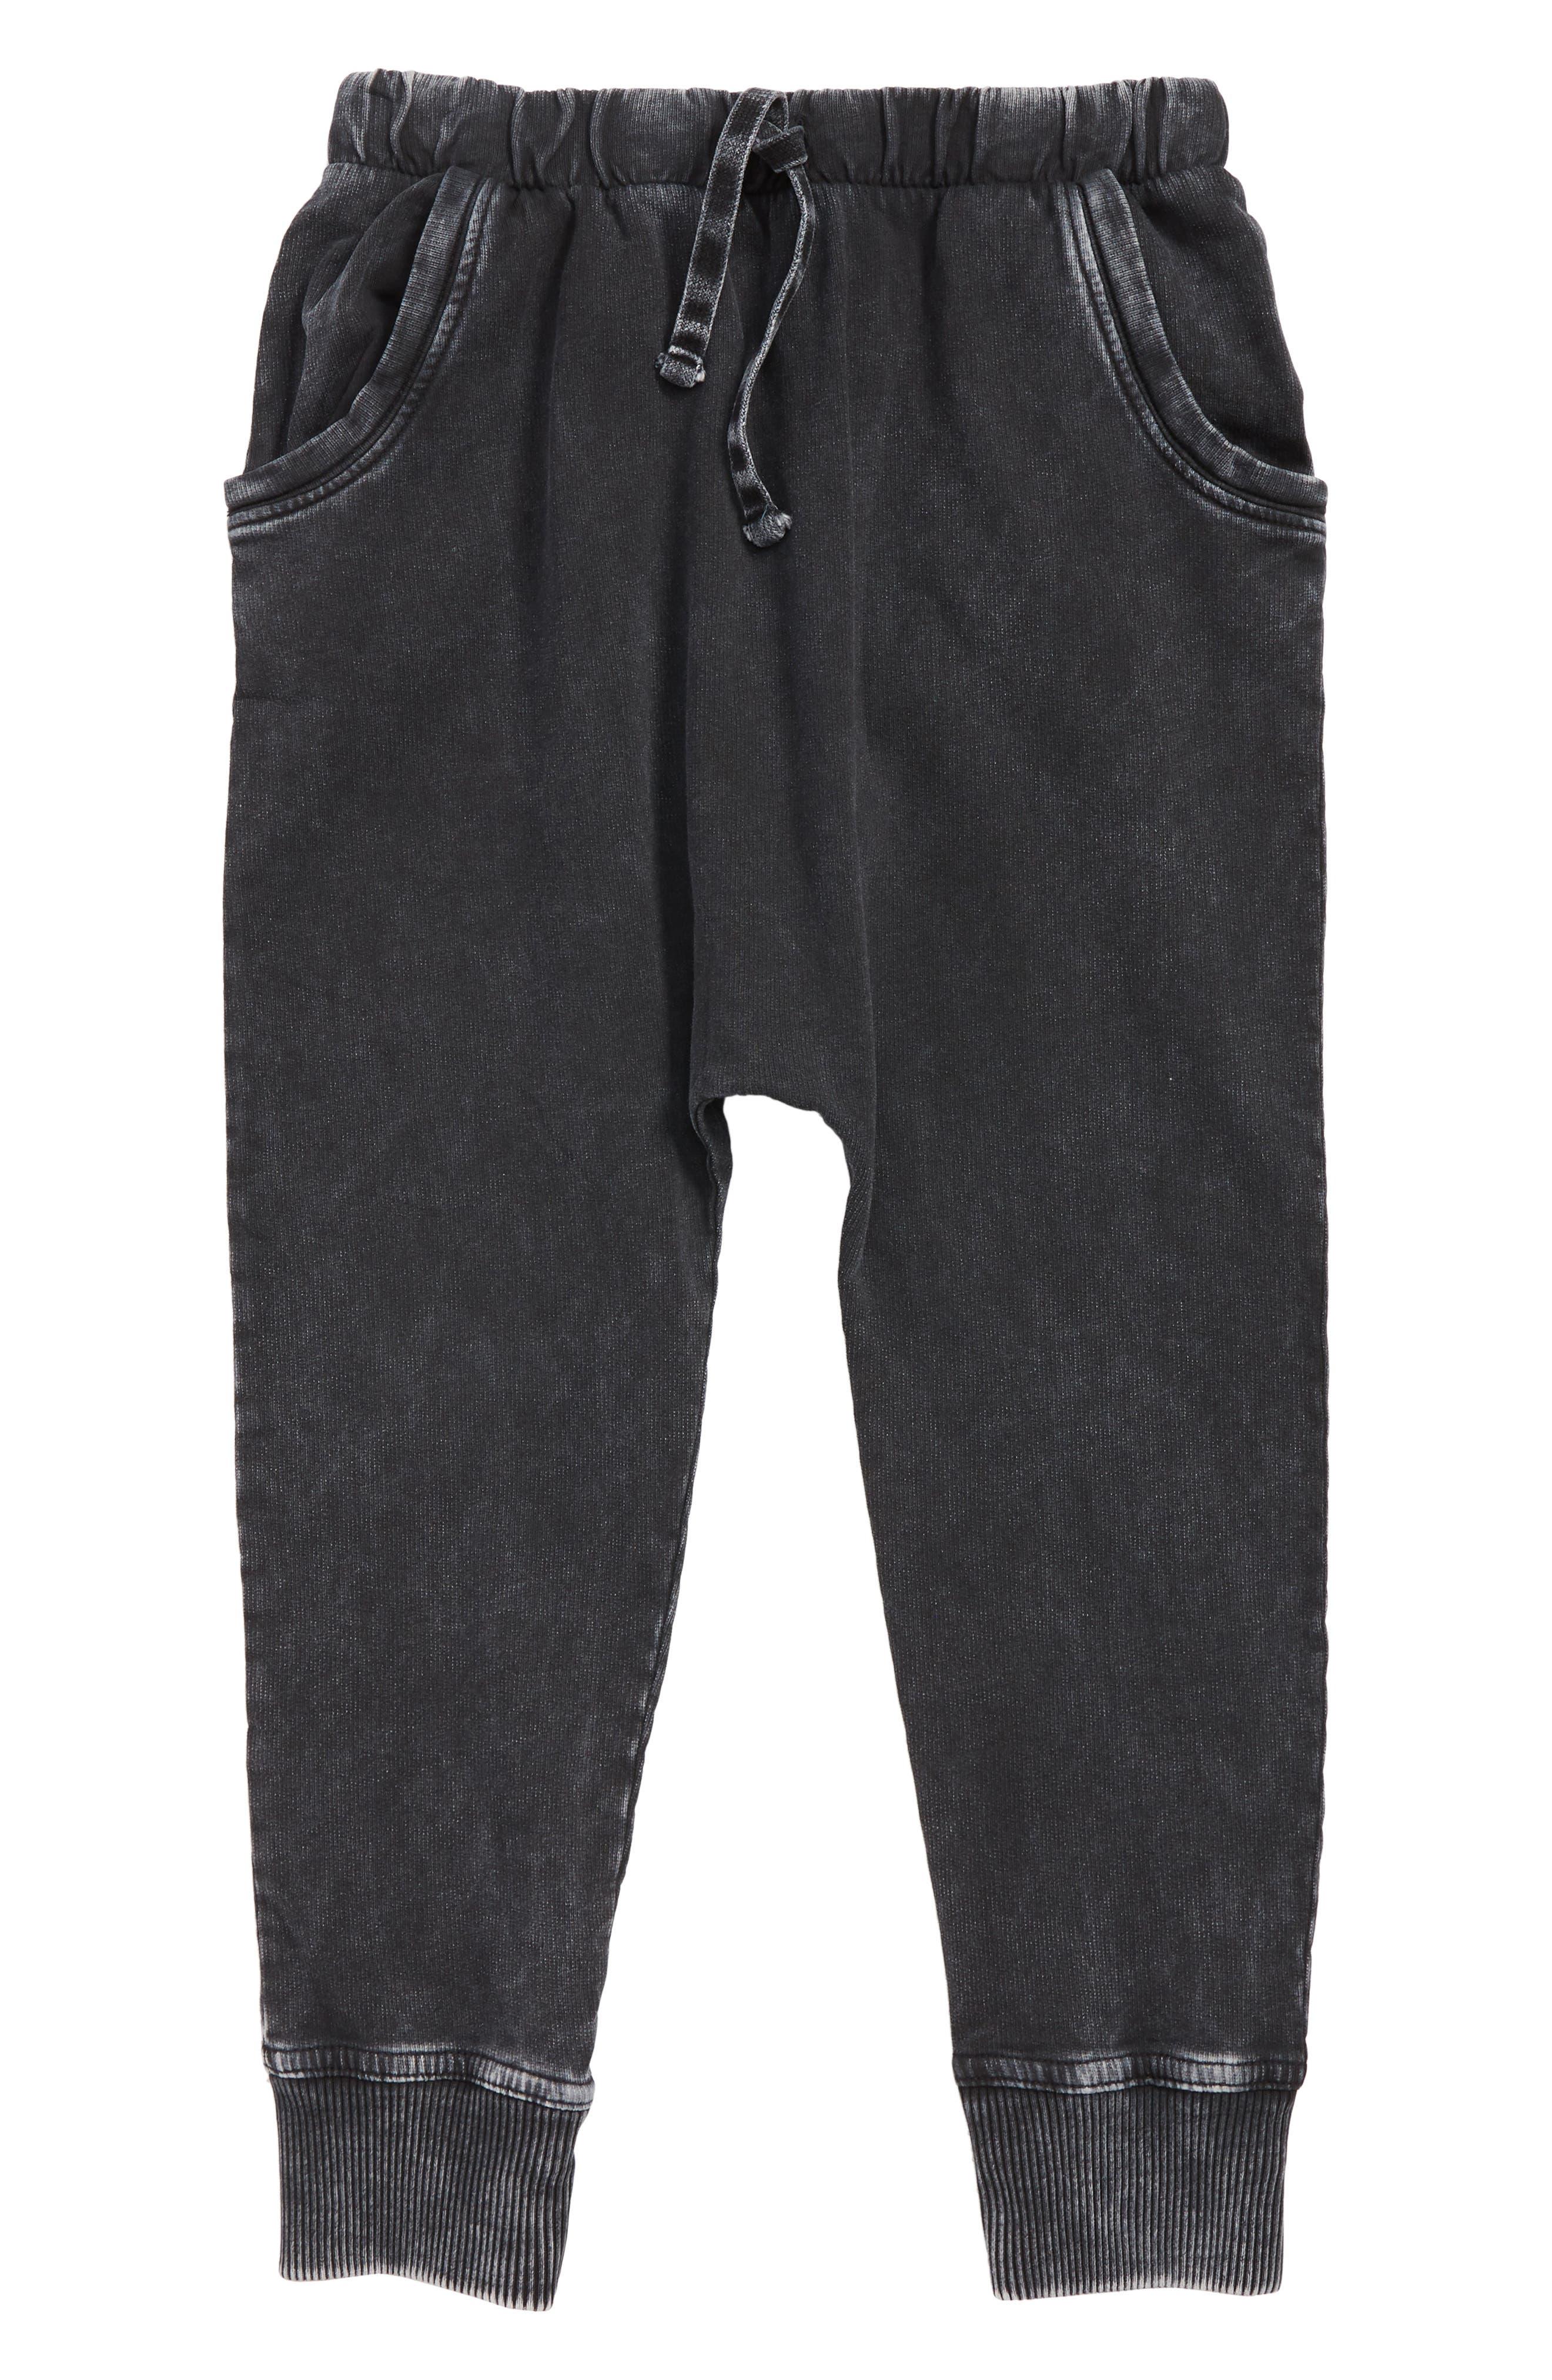 Boys Stem Superwash Sweatpants Size 7  Black